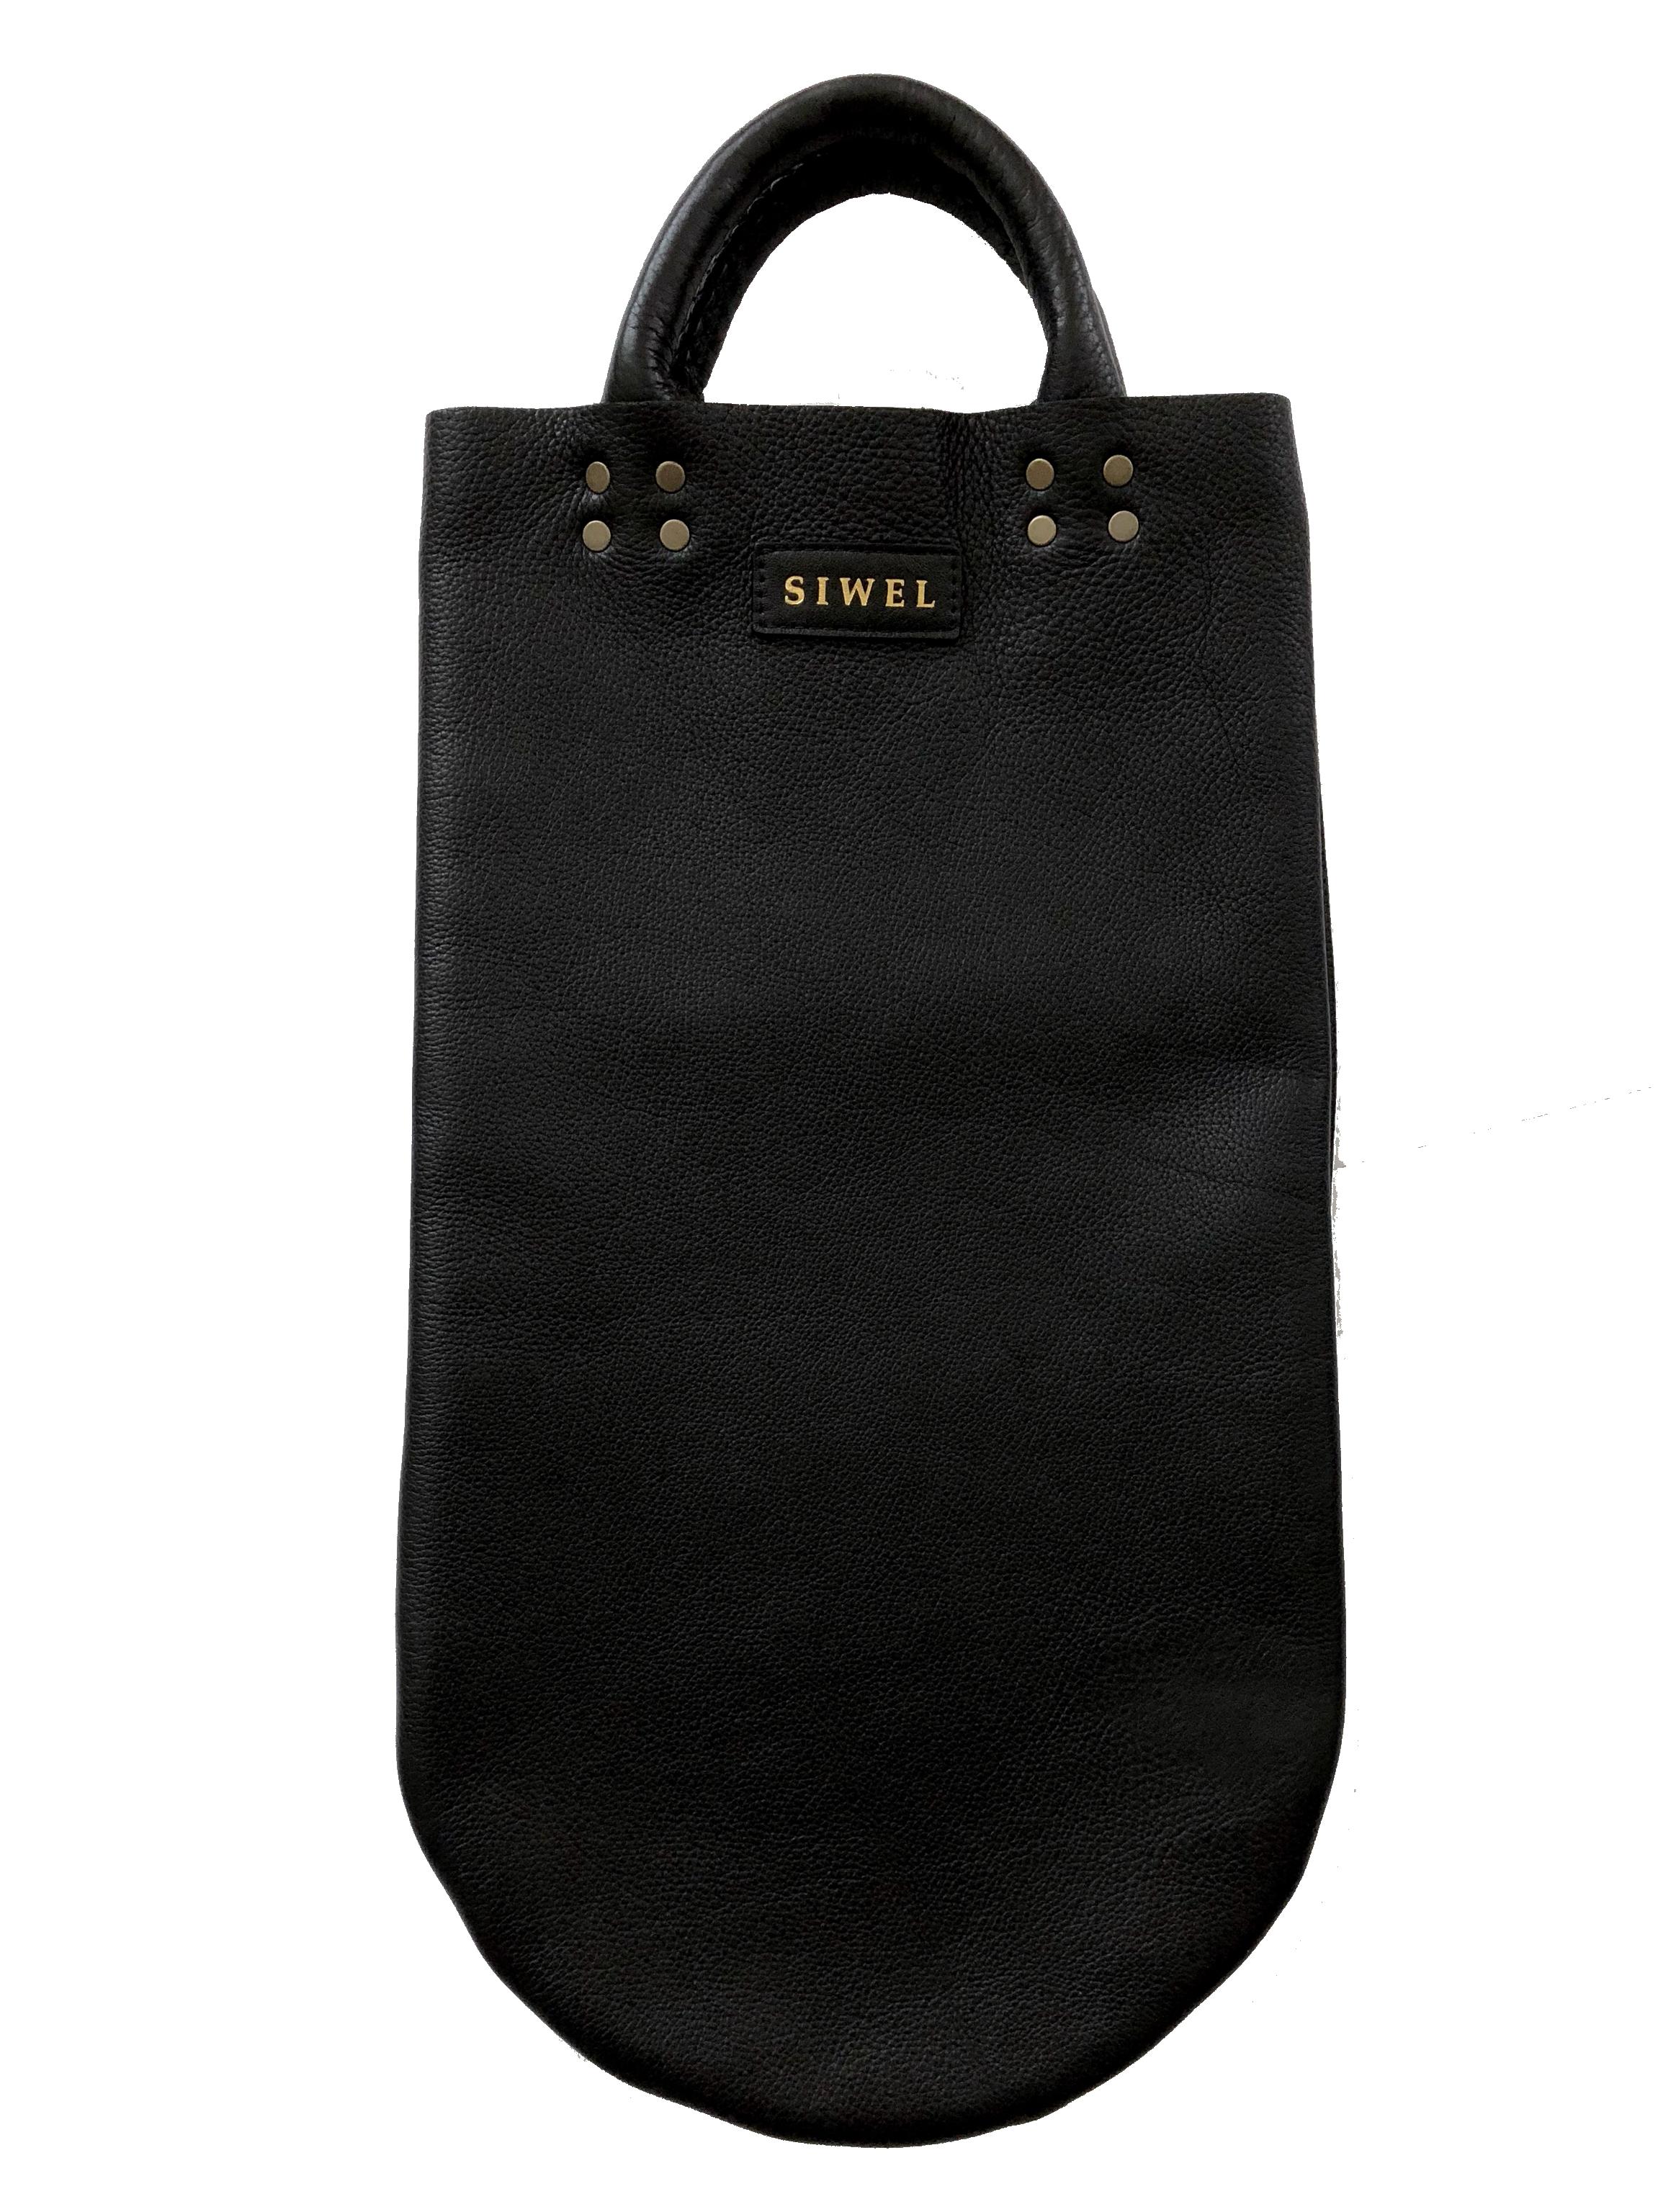 SIWEL handbags 5.JPG